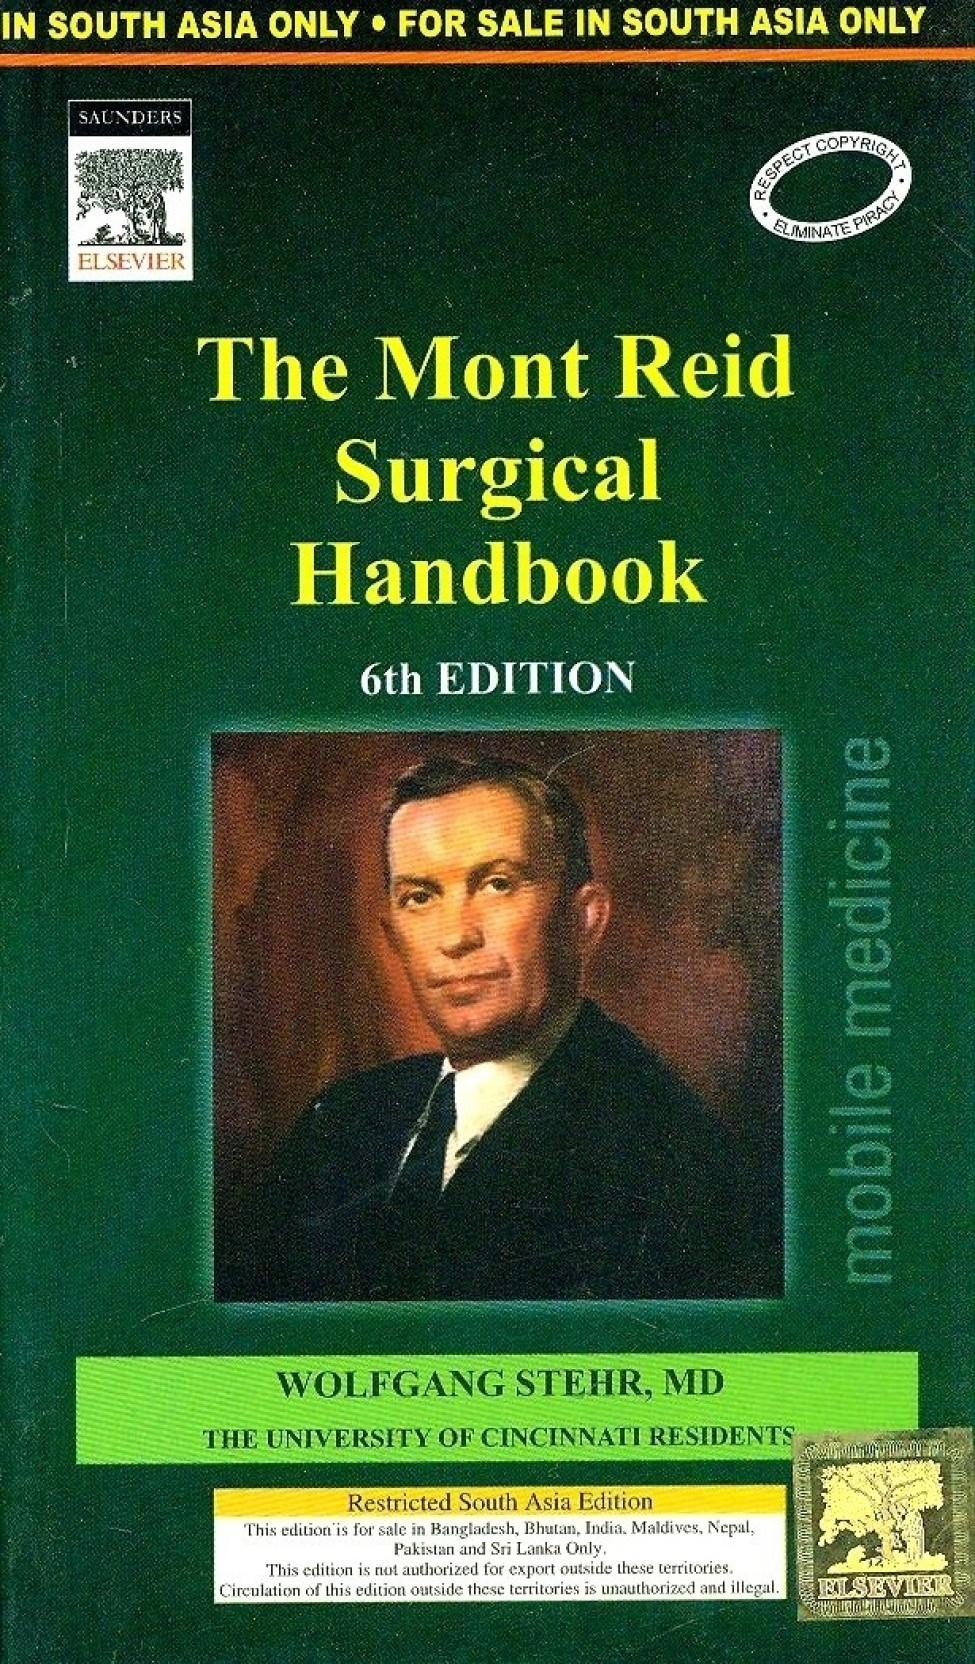 mont reid surgical handbook pdf download